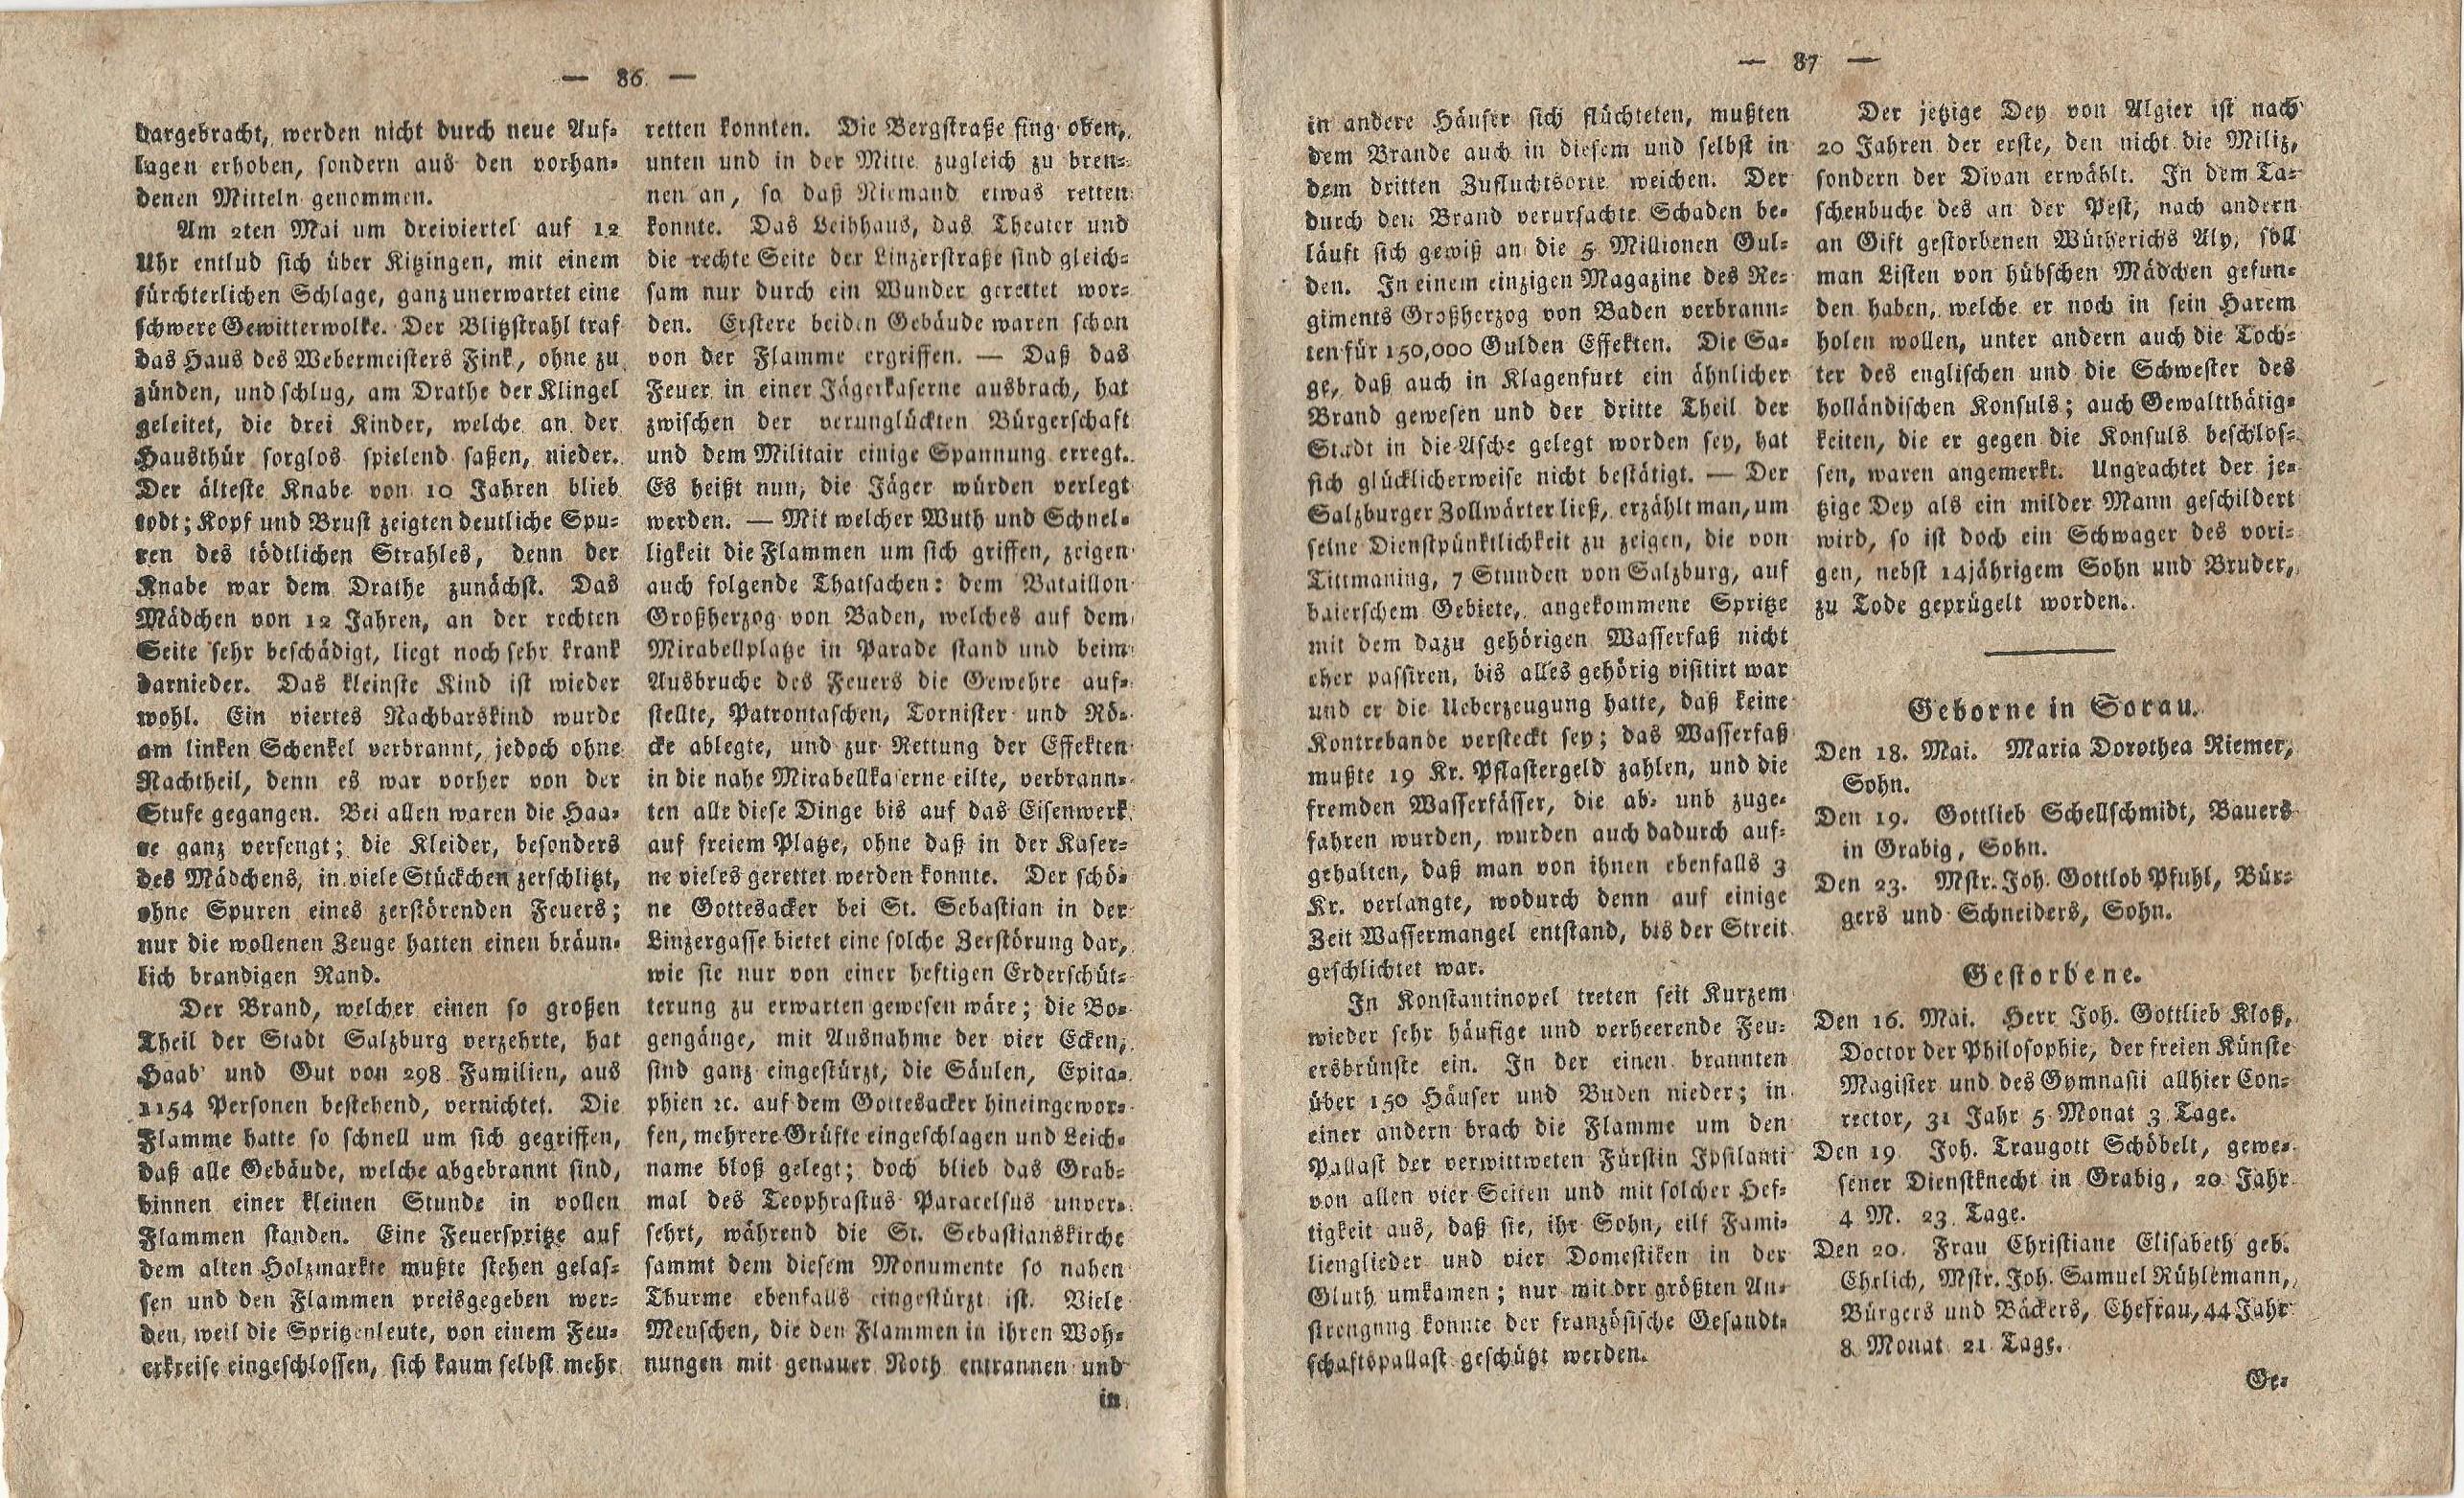 sorauer-wochenblatt-stadtbrand-1818-sazburg-2-kopie-kopie.jpeg